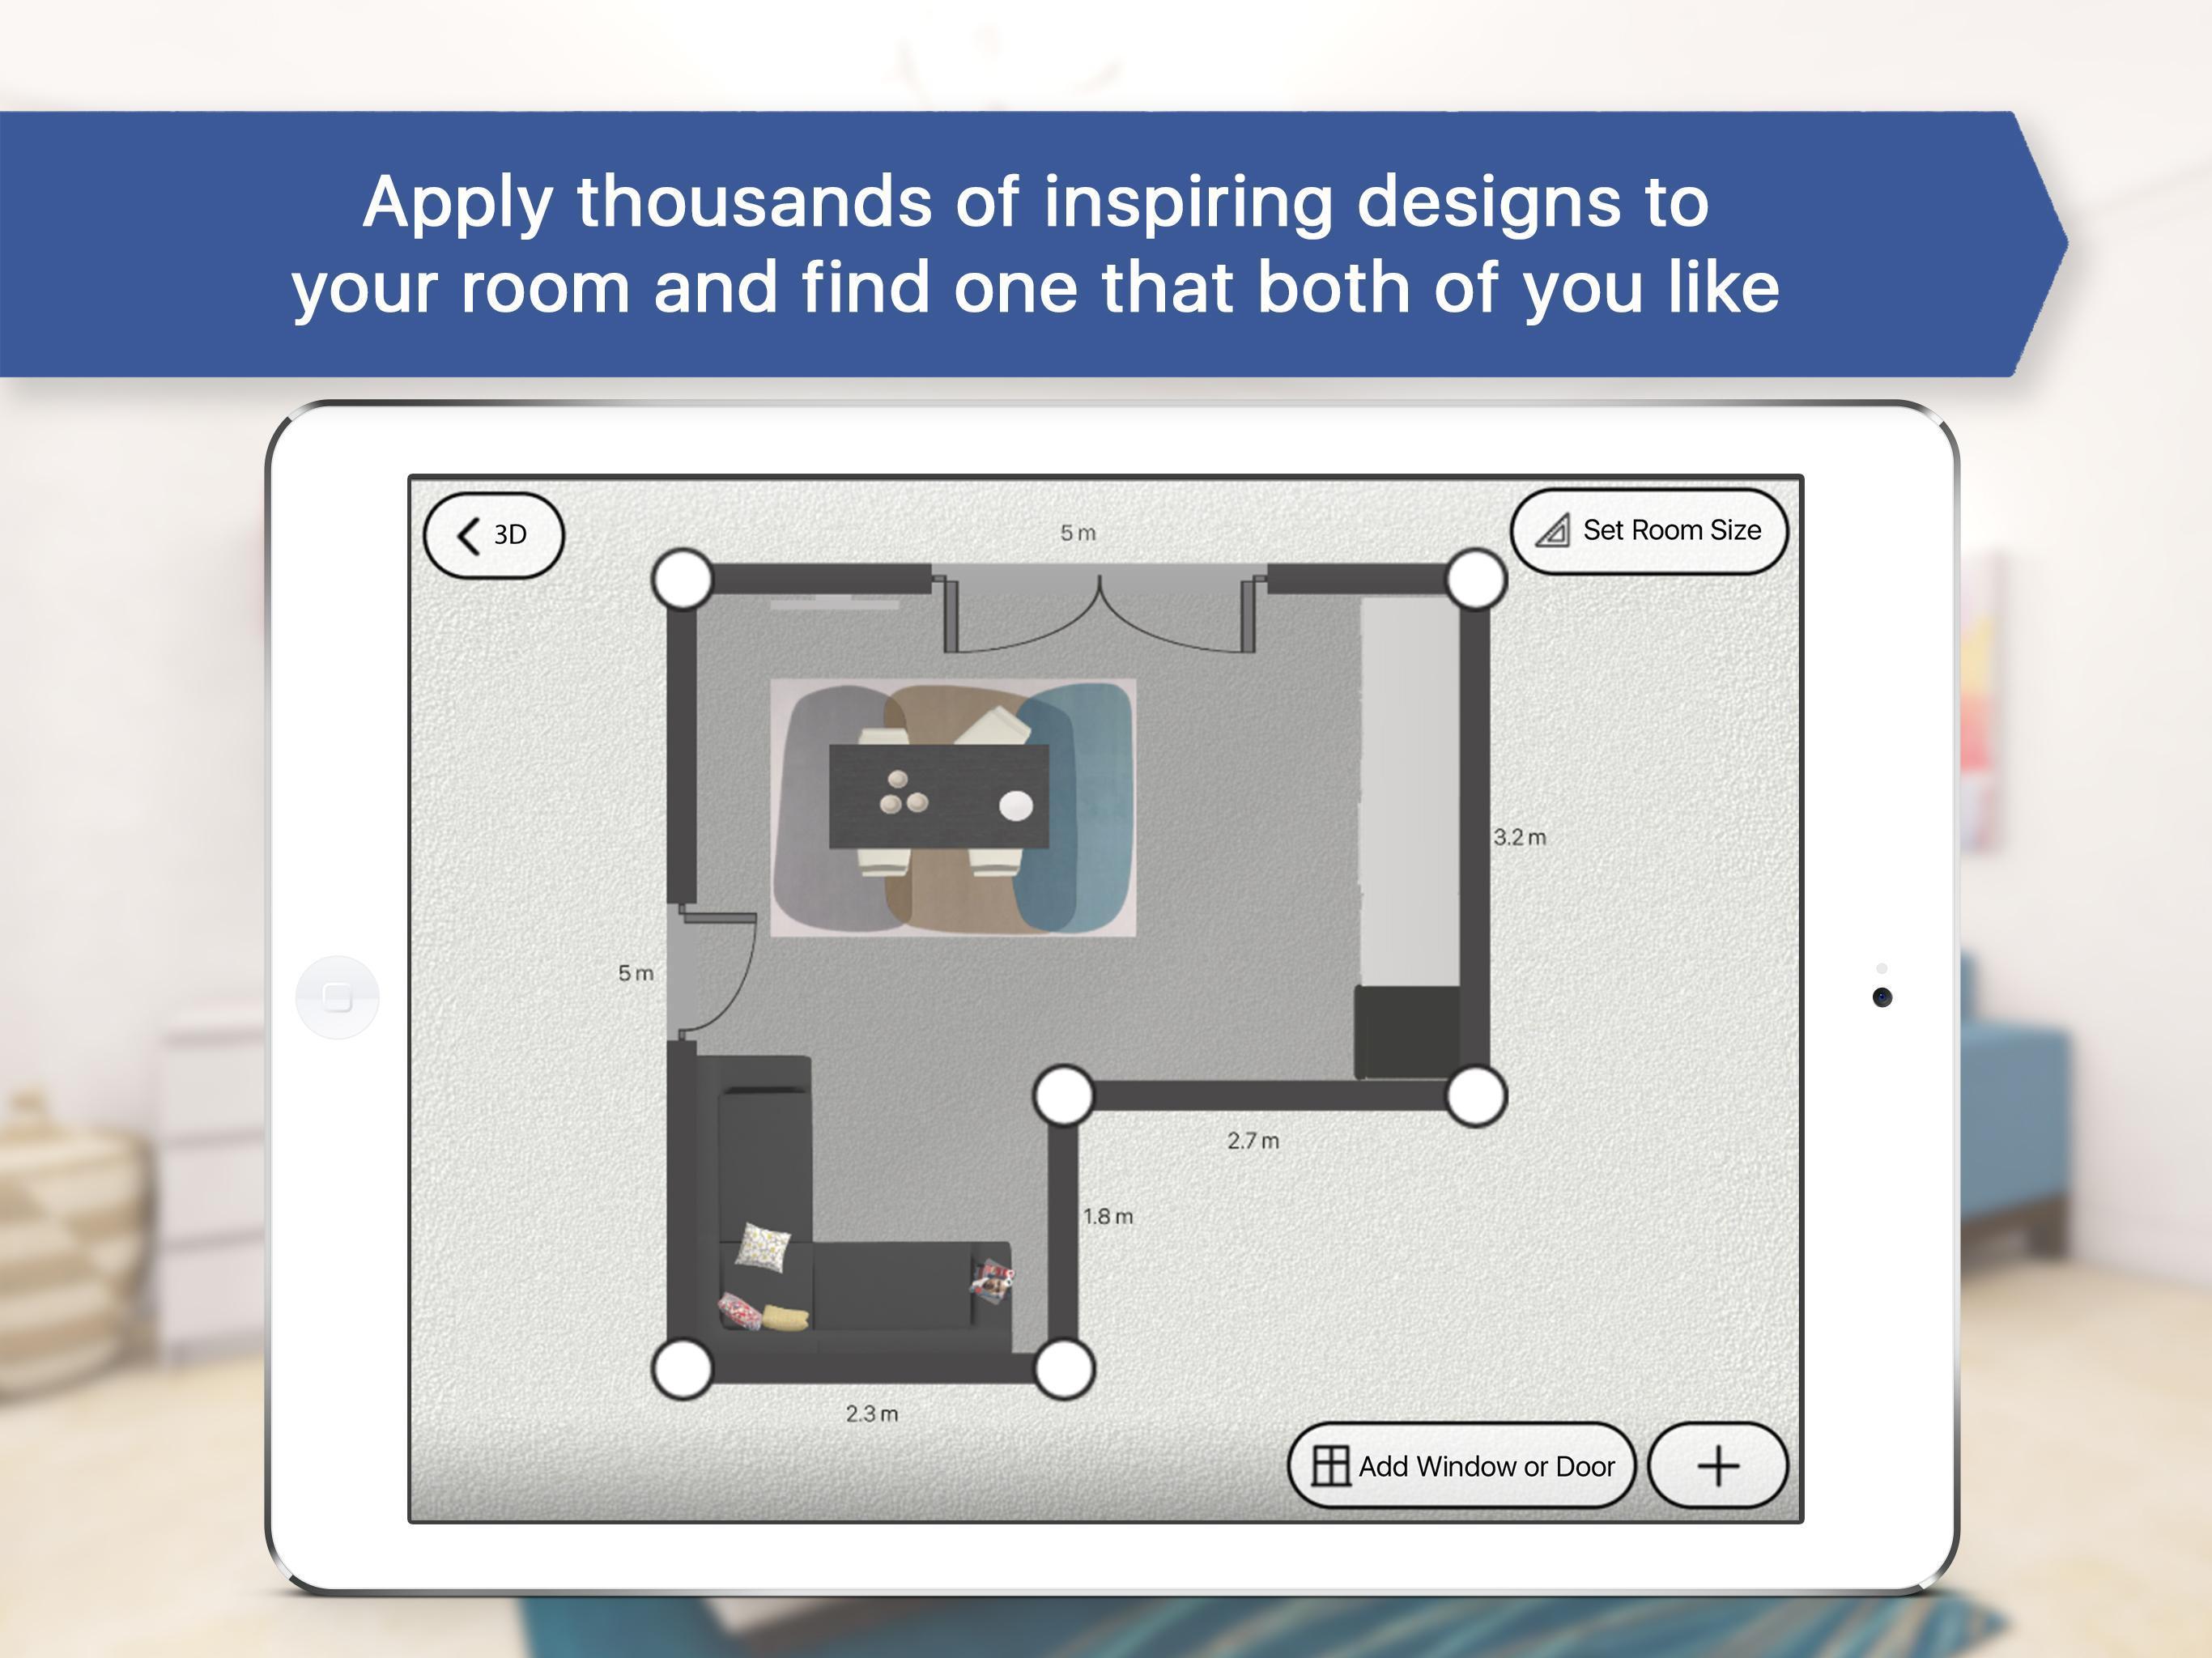 3D Bedroom for IKEA: Room Interior Design Planner for